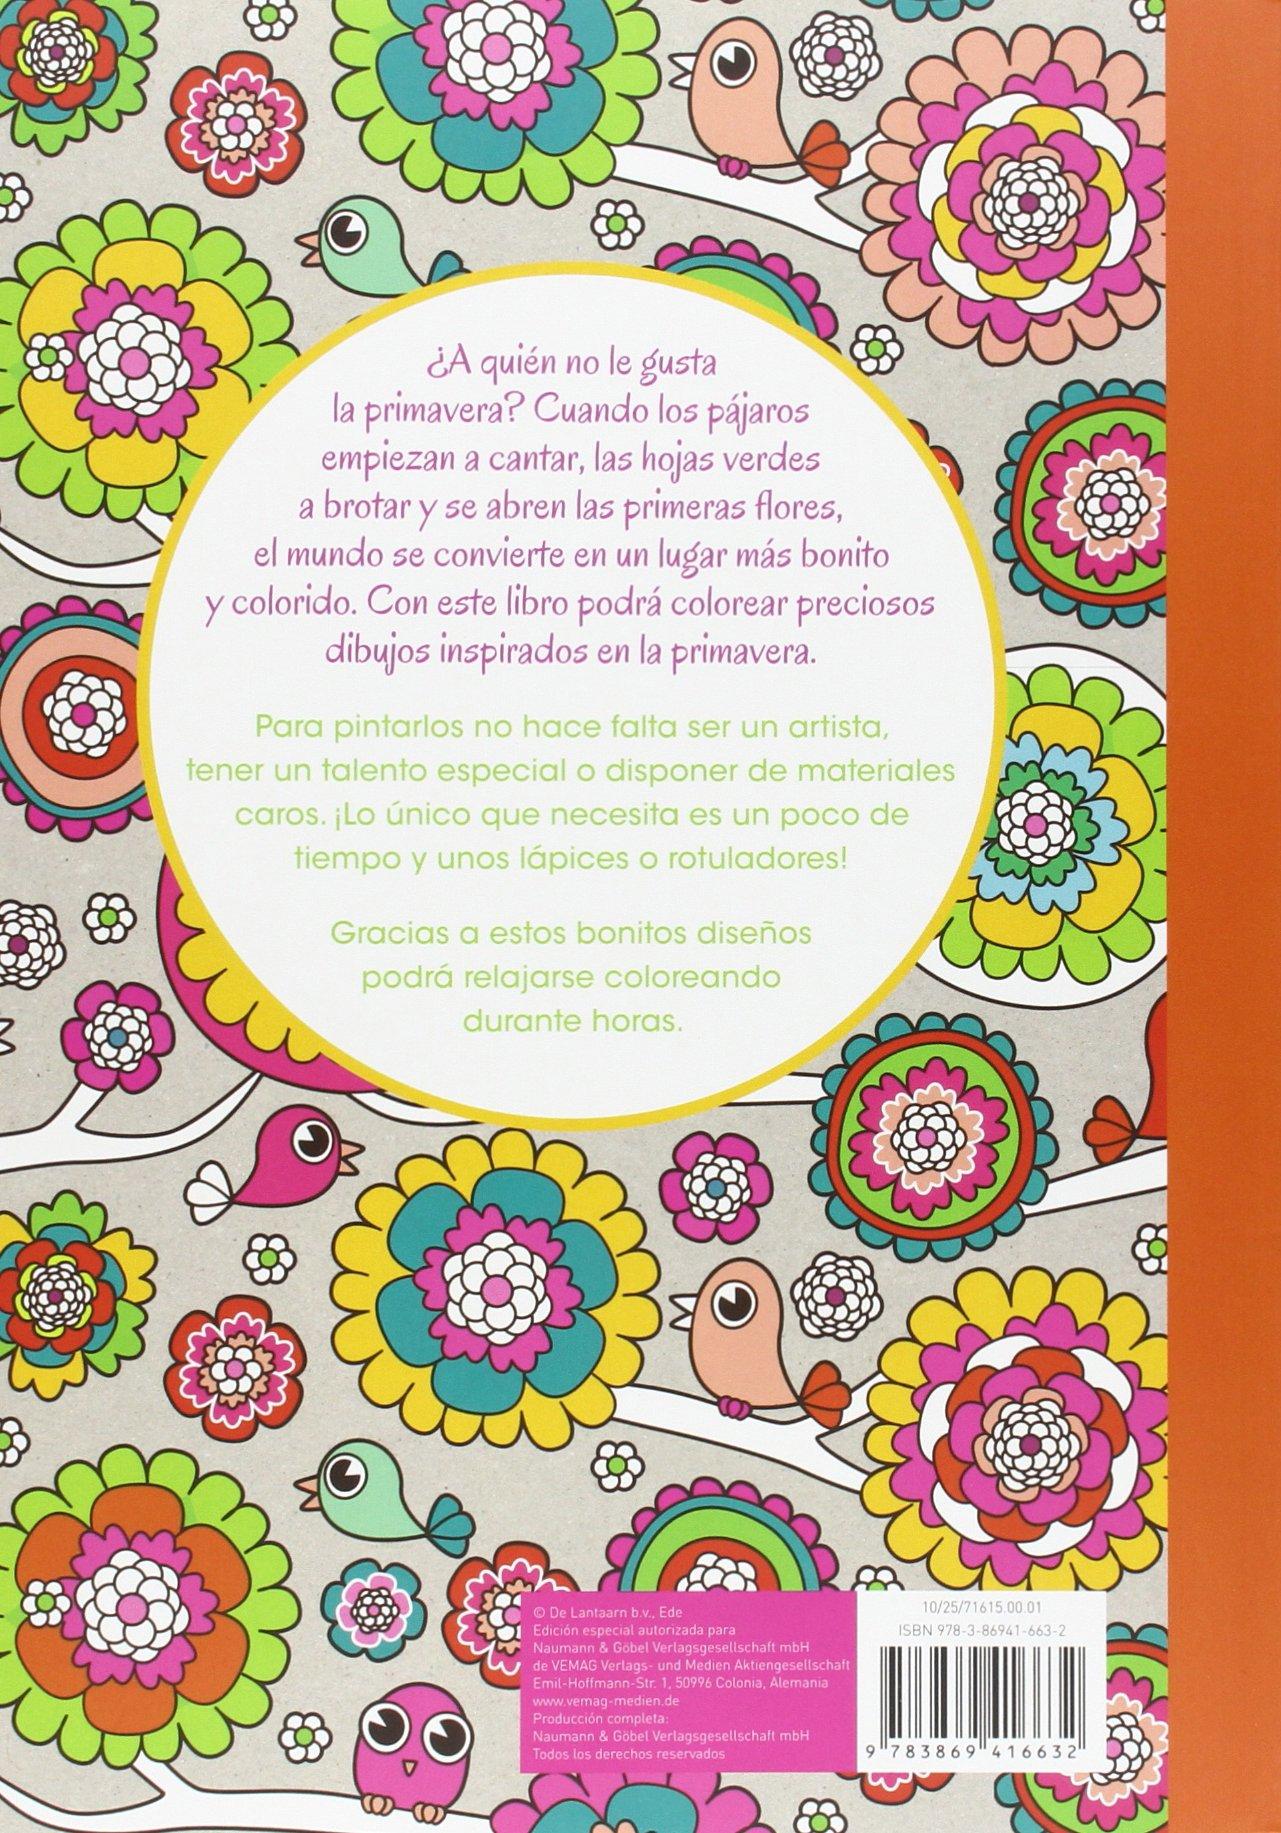 Colorida primavera: Pintar para relajarse: VV.AA.: 9783869416632: Amazon.com: Books